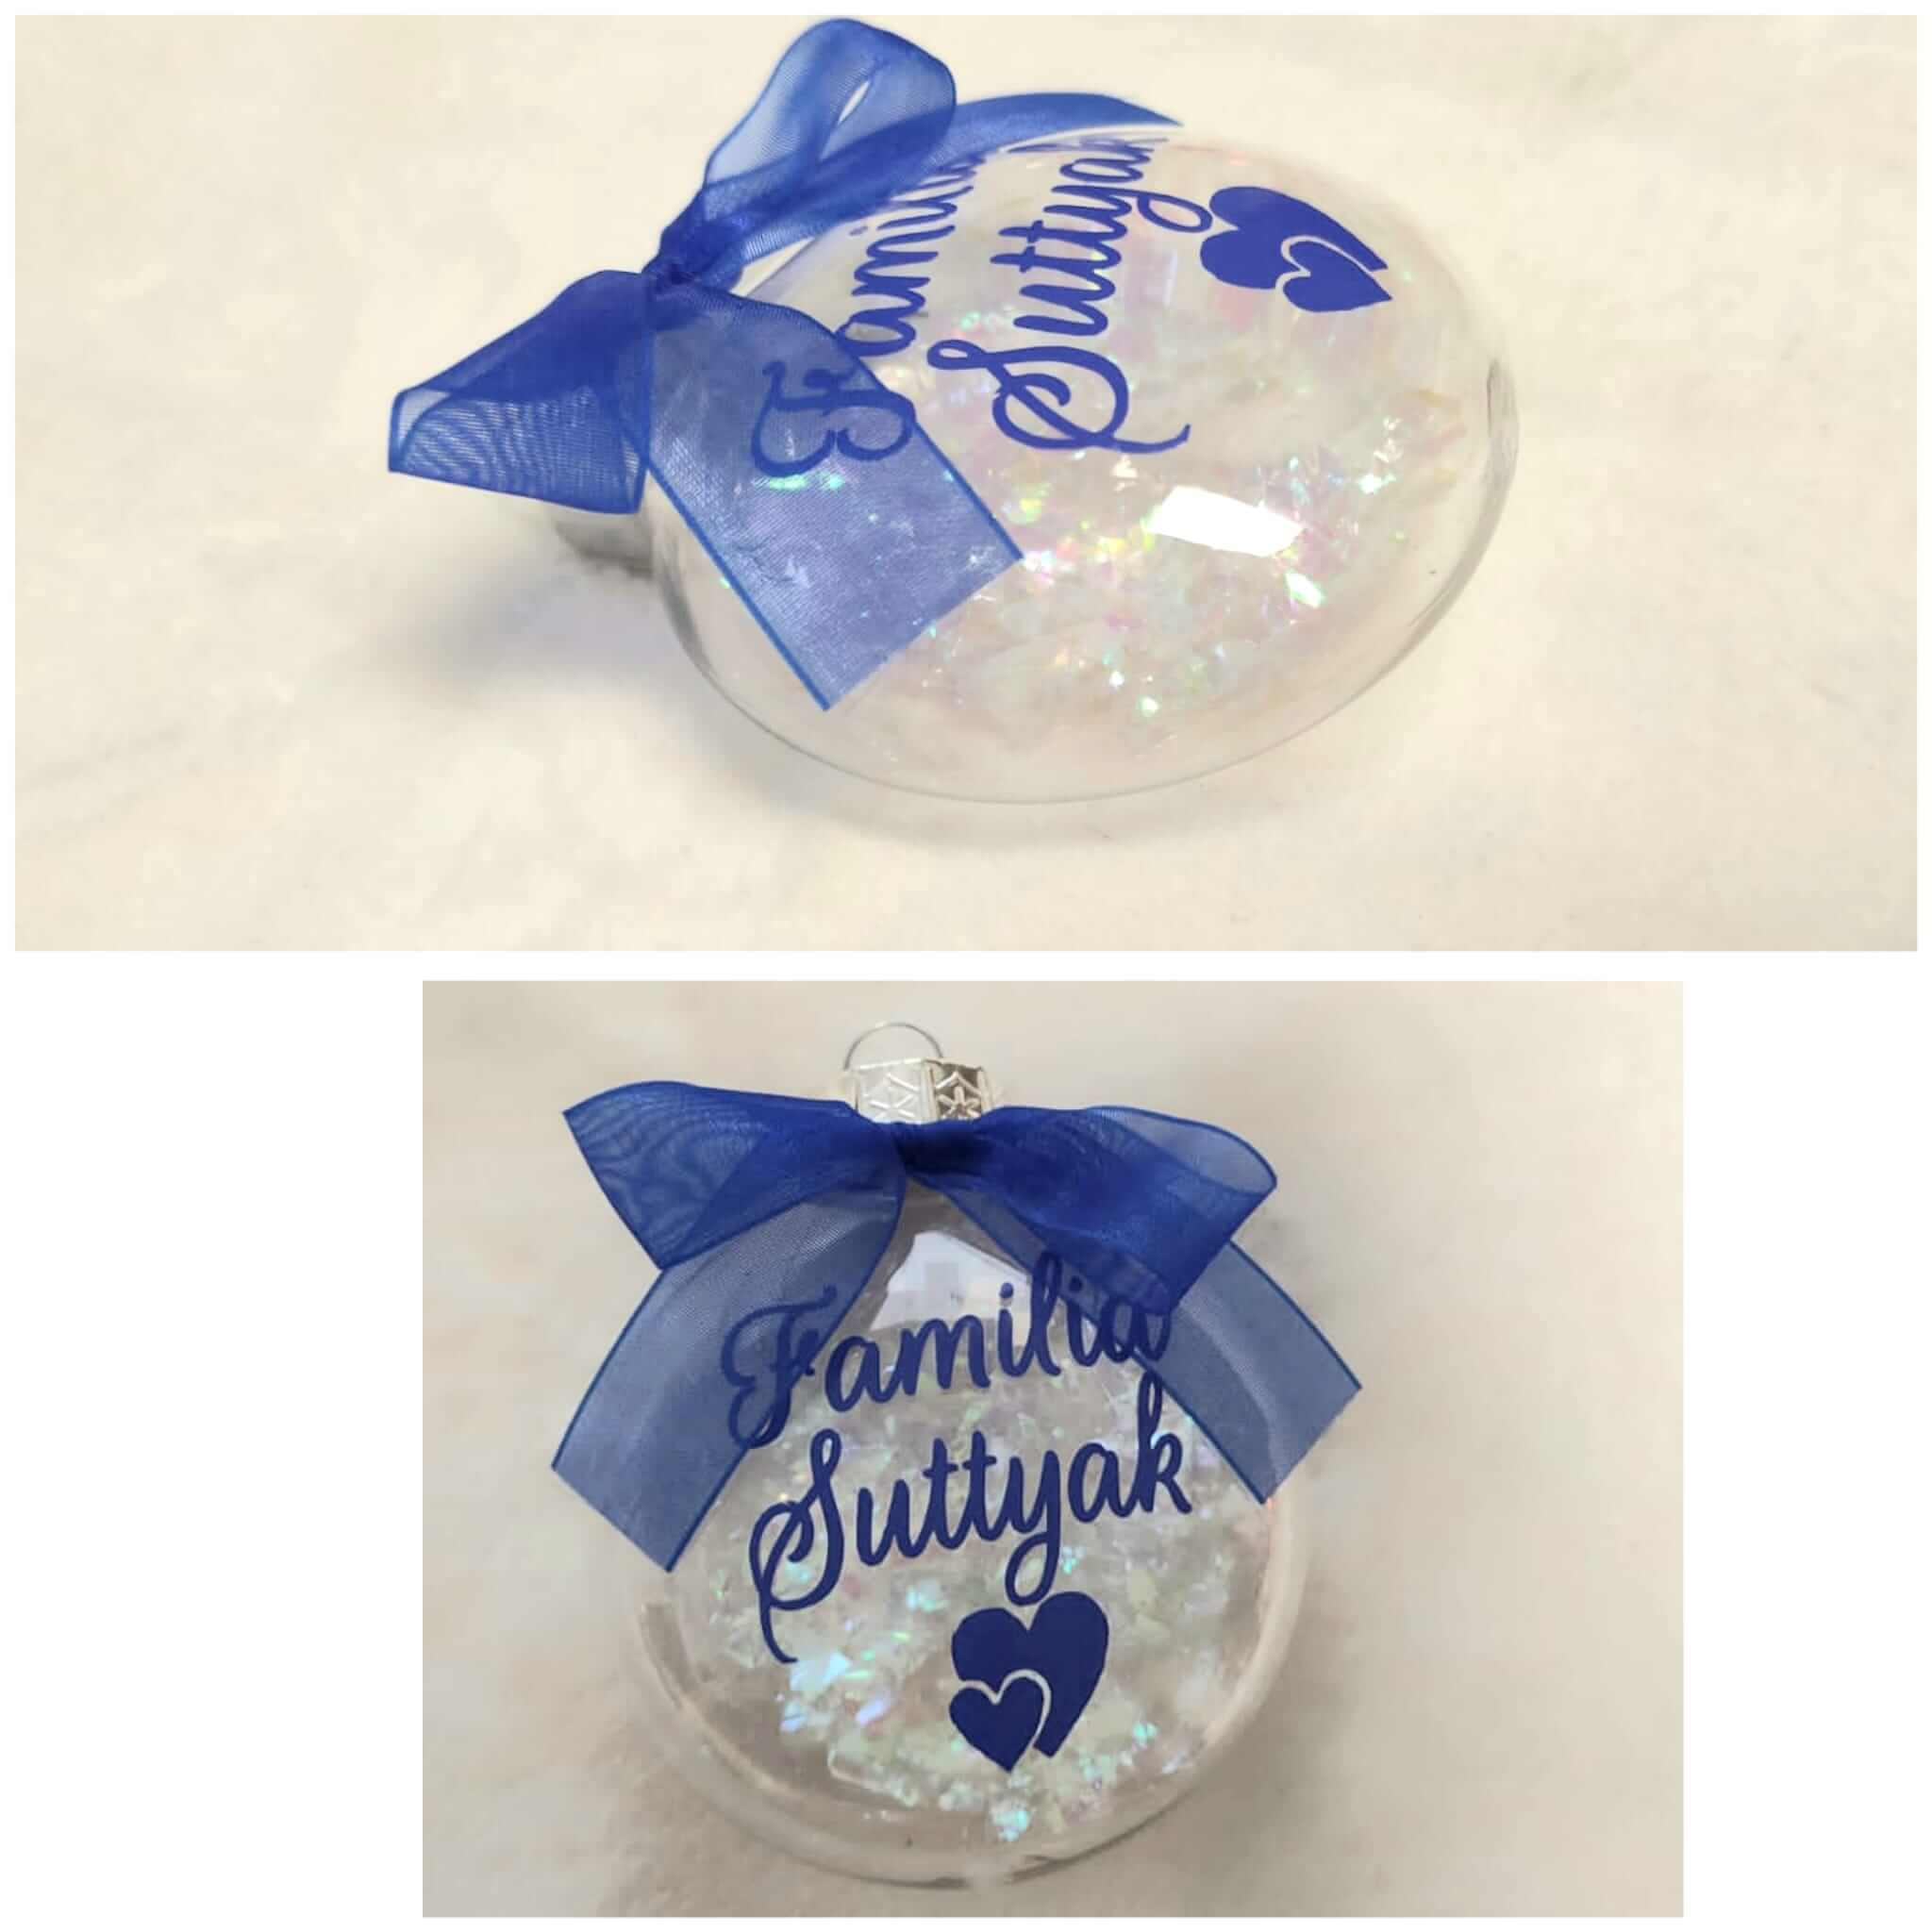 Bola de navidad palana transparente personalizada